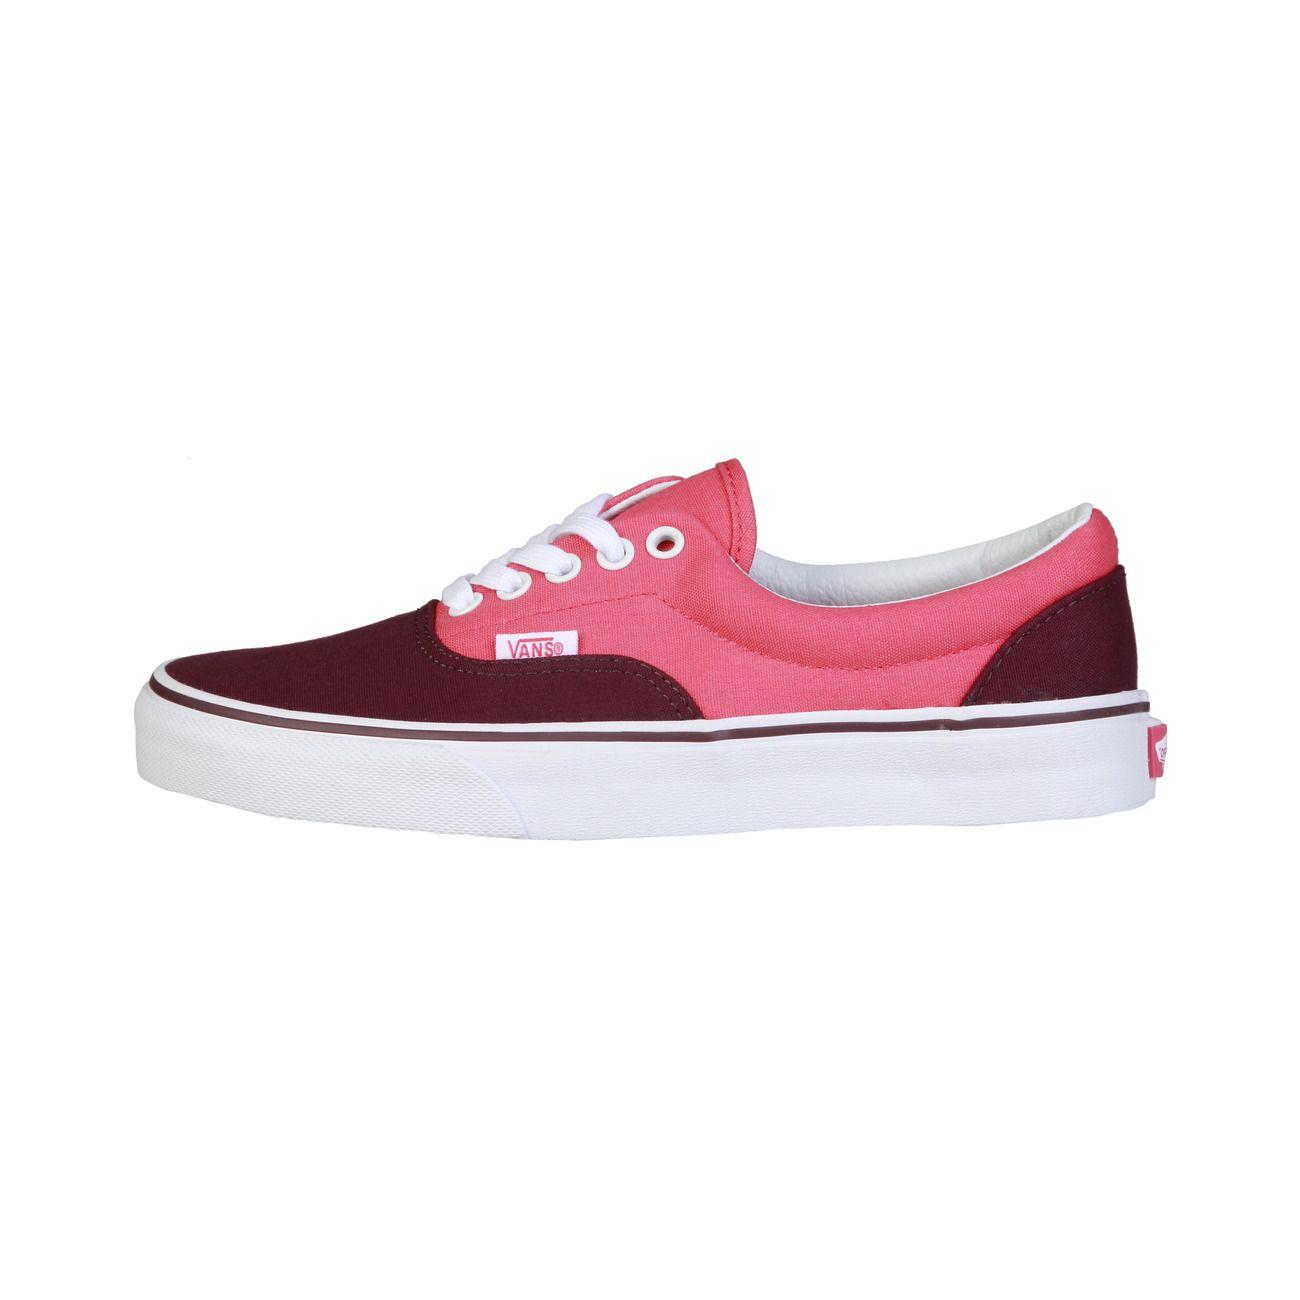 scarpe vans basse estive